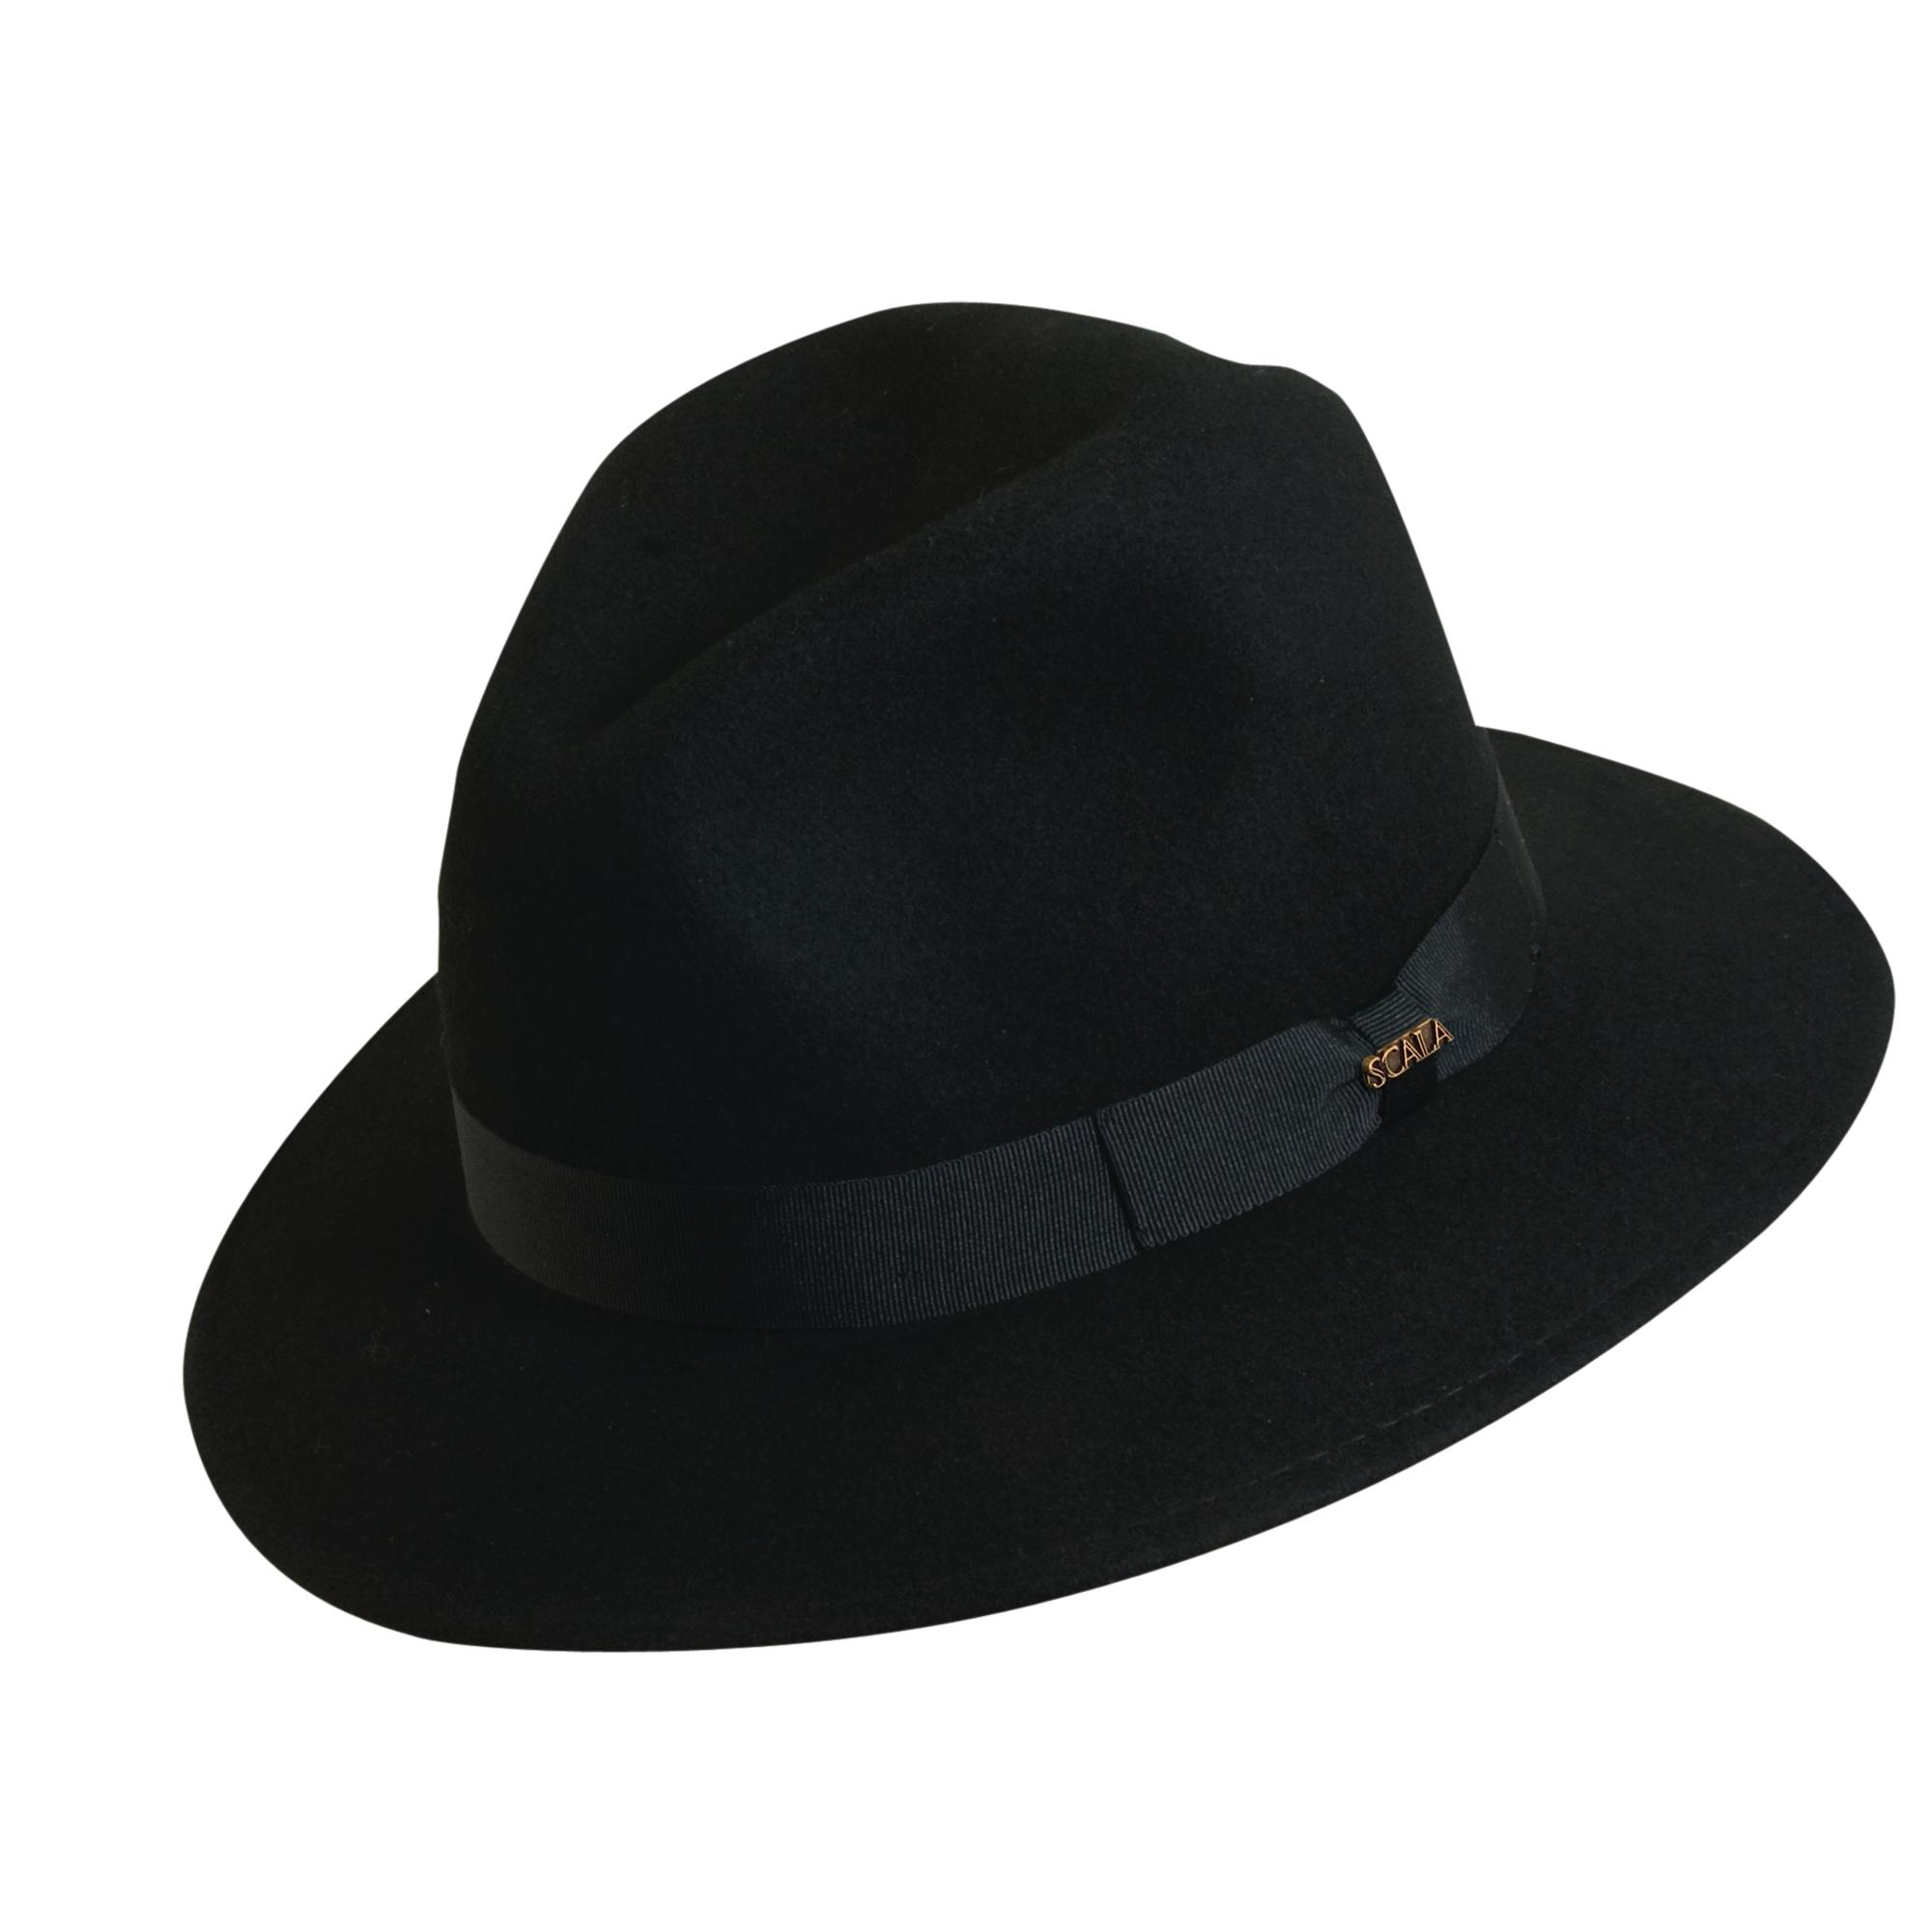 6b51b0cc5e3 Scala Classico Men s 100% Wool Crushable Safari Hat